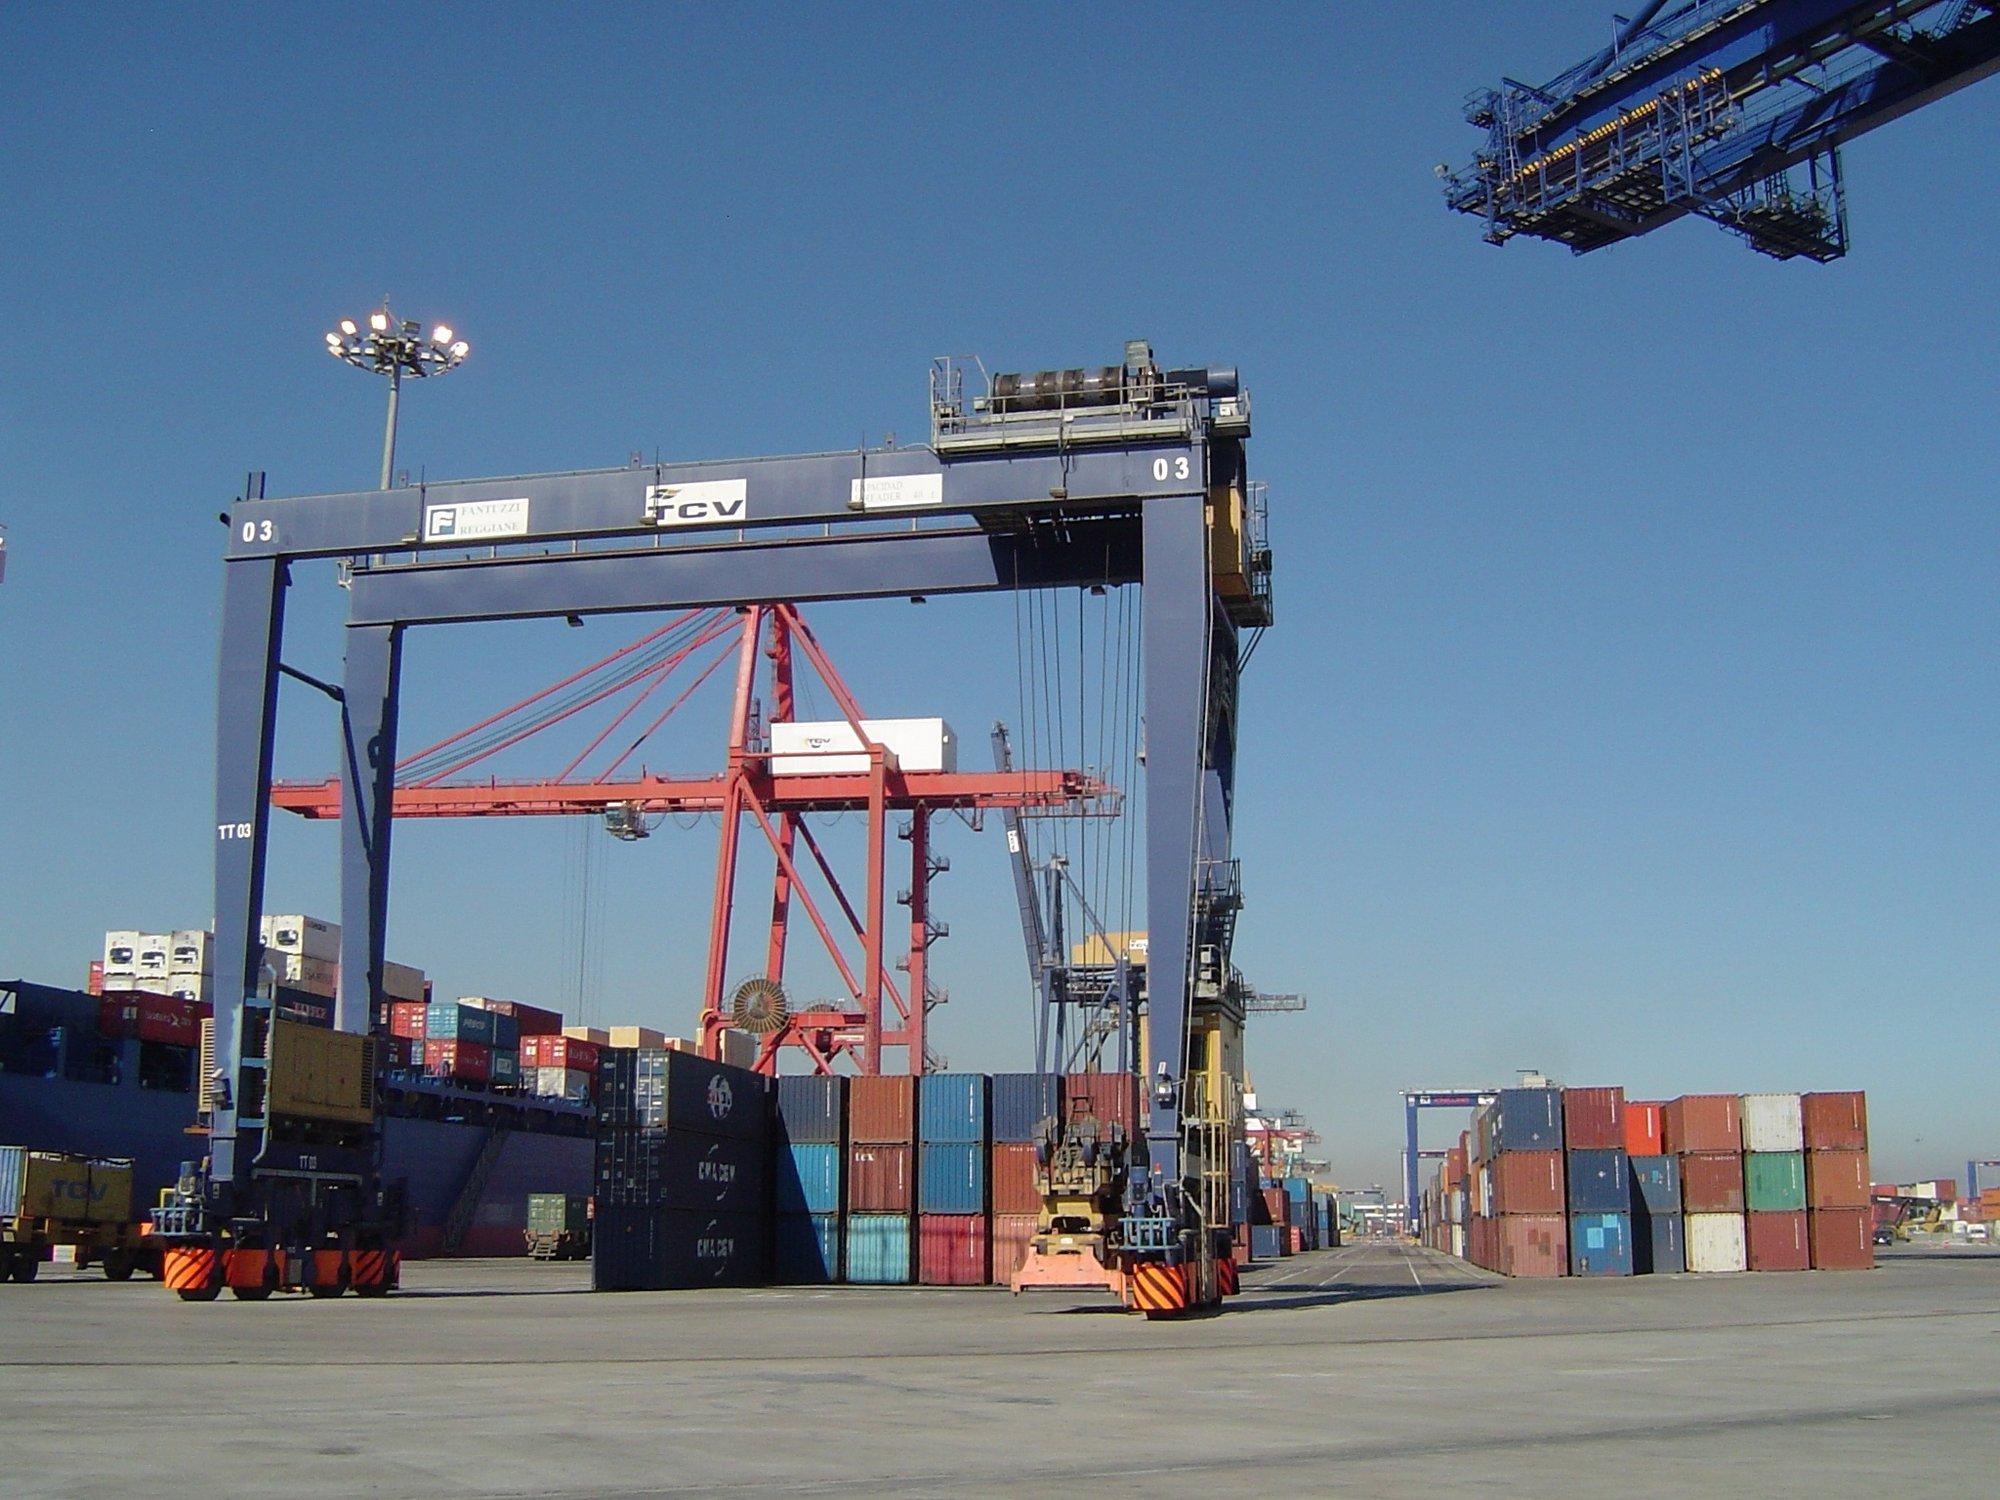 El déficit comercial cayó un 11,4% en 2011